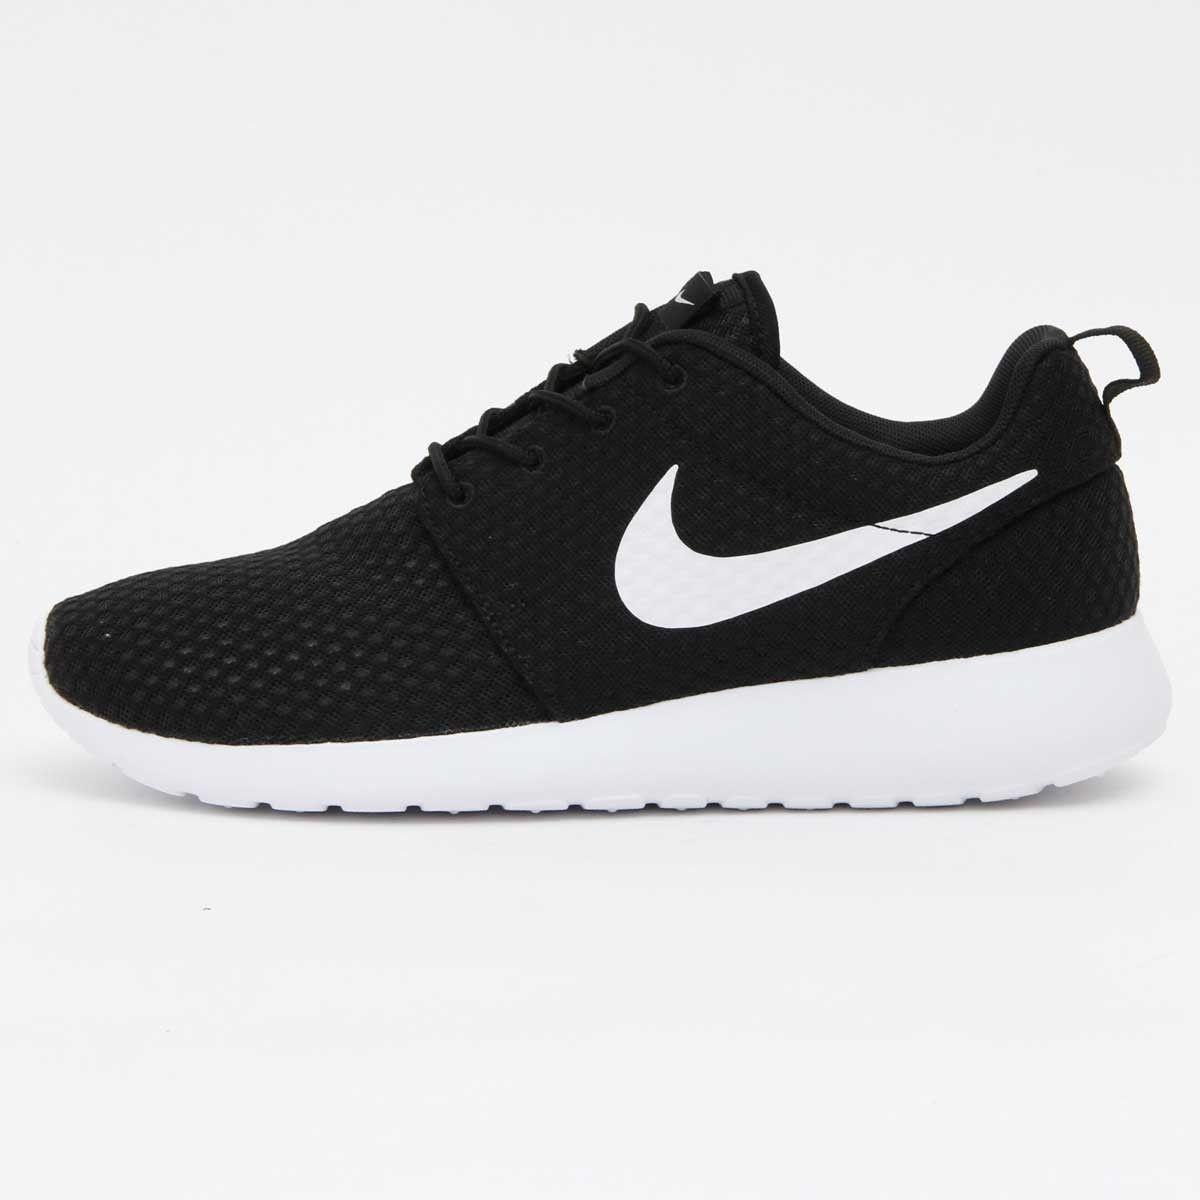 reputable site 76626 74541 Nike Rosherun BR BlackWhite 718552-011